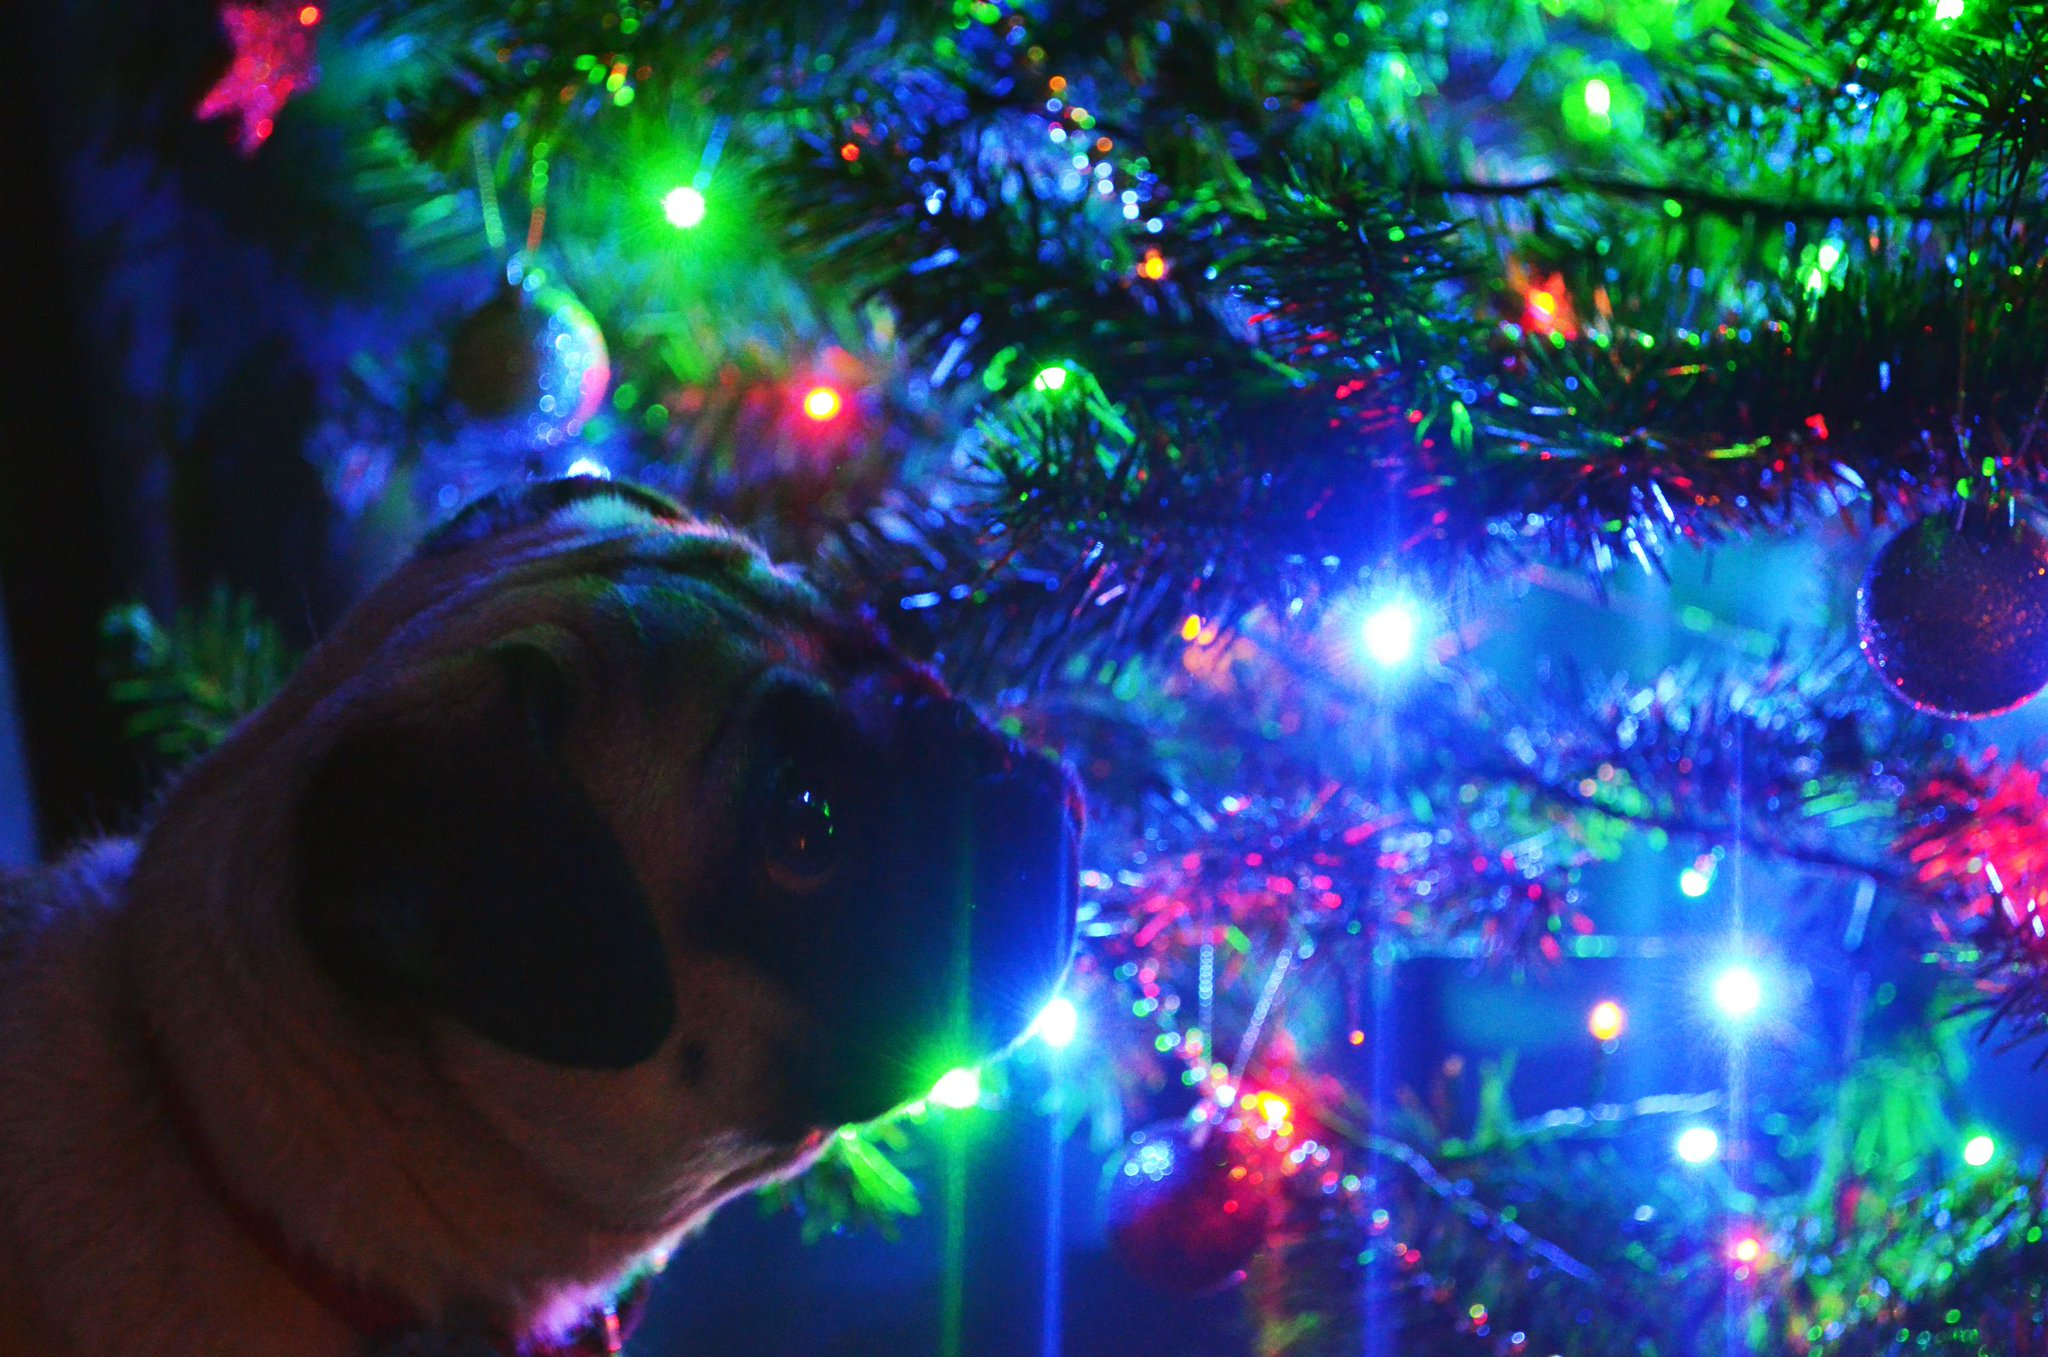 Merry Christmas! http://t.co/is3EzAKdtC